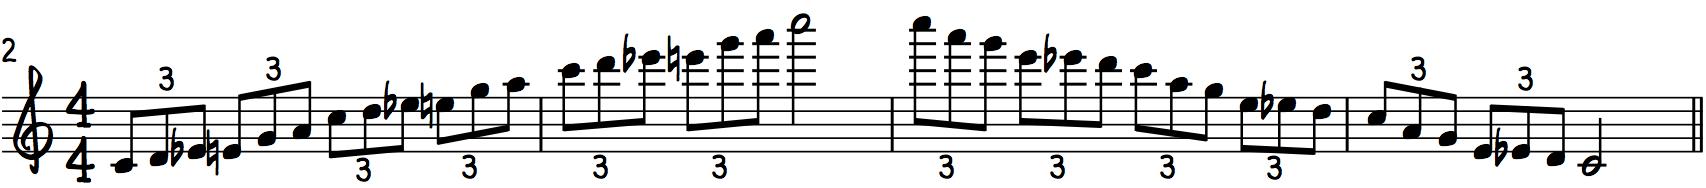 C Gospel Scale Exercise in 3 octaves beginner jazz piano scale